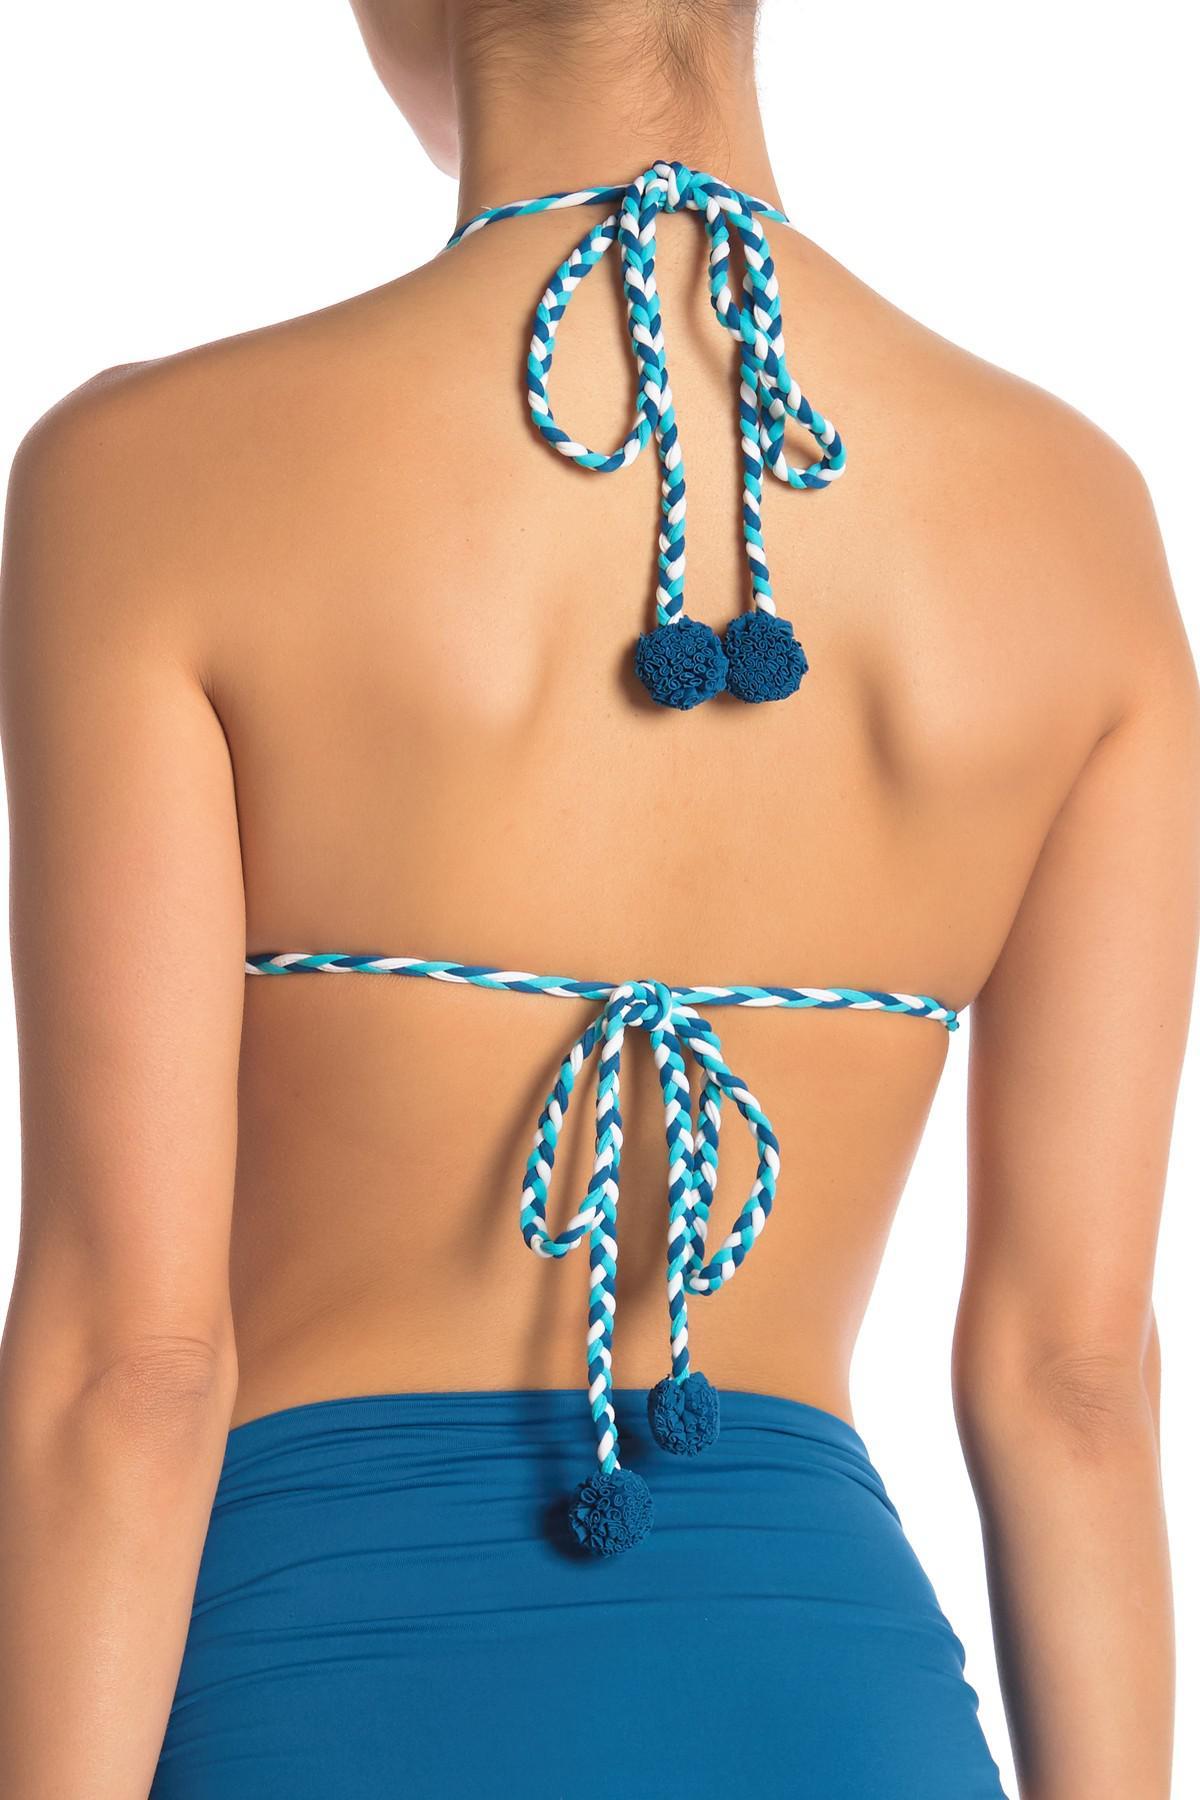 64a4d9256b Vince Camuto - Blue Braided Triangle Bikini Top - Lyst. View fullscreen